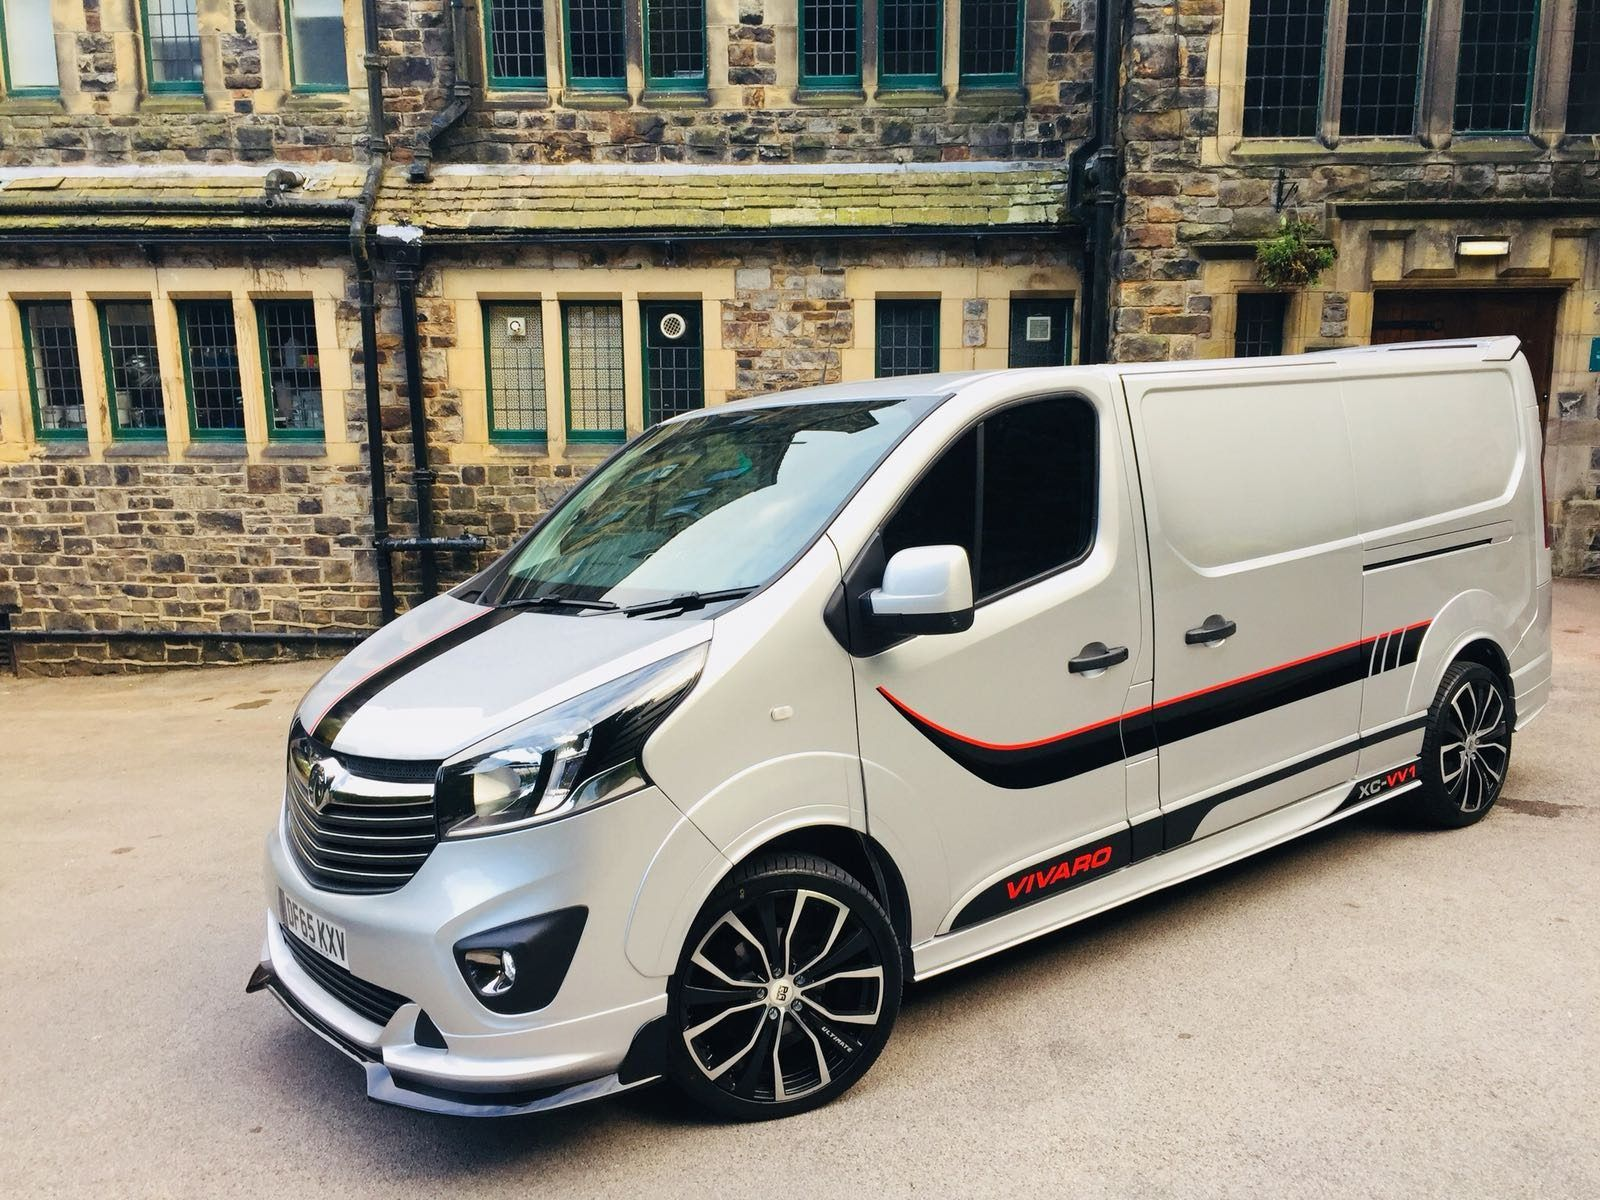 Vauxhall Vivaro Body Kit Xclusive Customz In 2020 Van Vauxhall Vauxhall Vivaro Camper